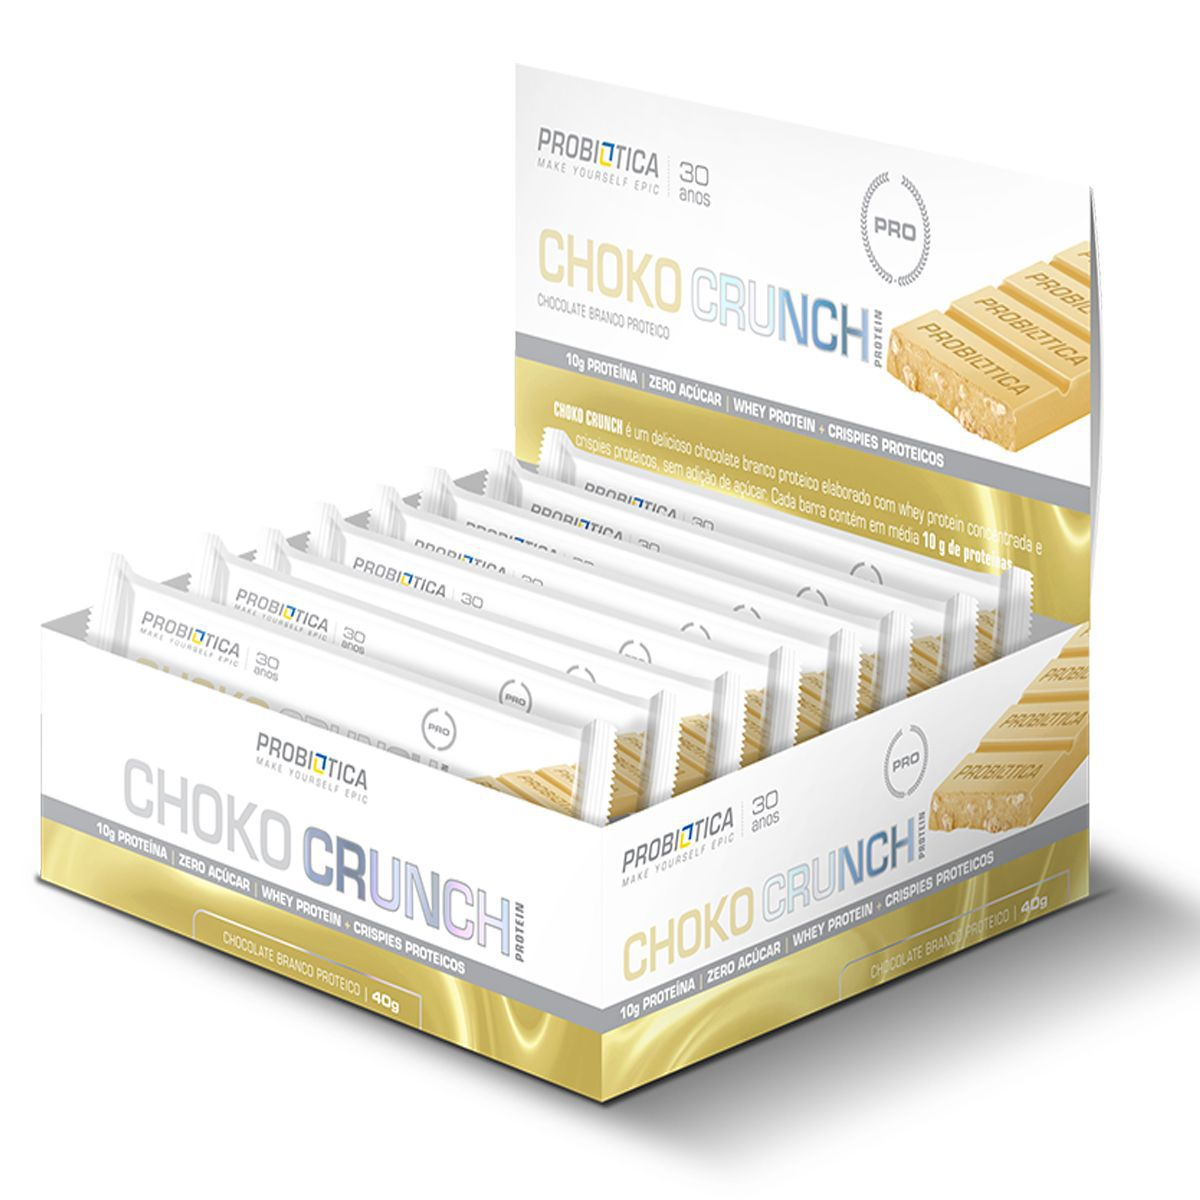 Choko Crunch Cx C/12 Barras de 40g Probiótica